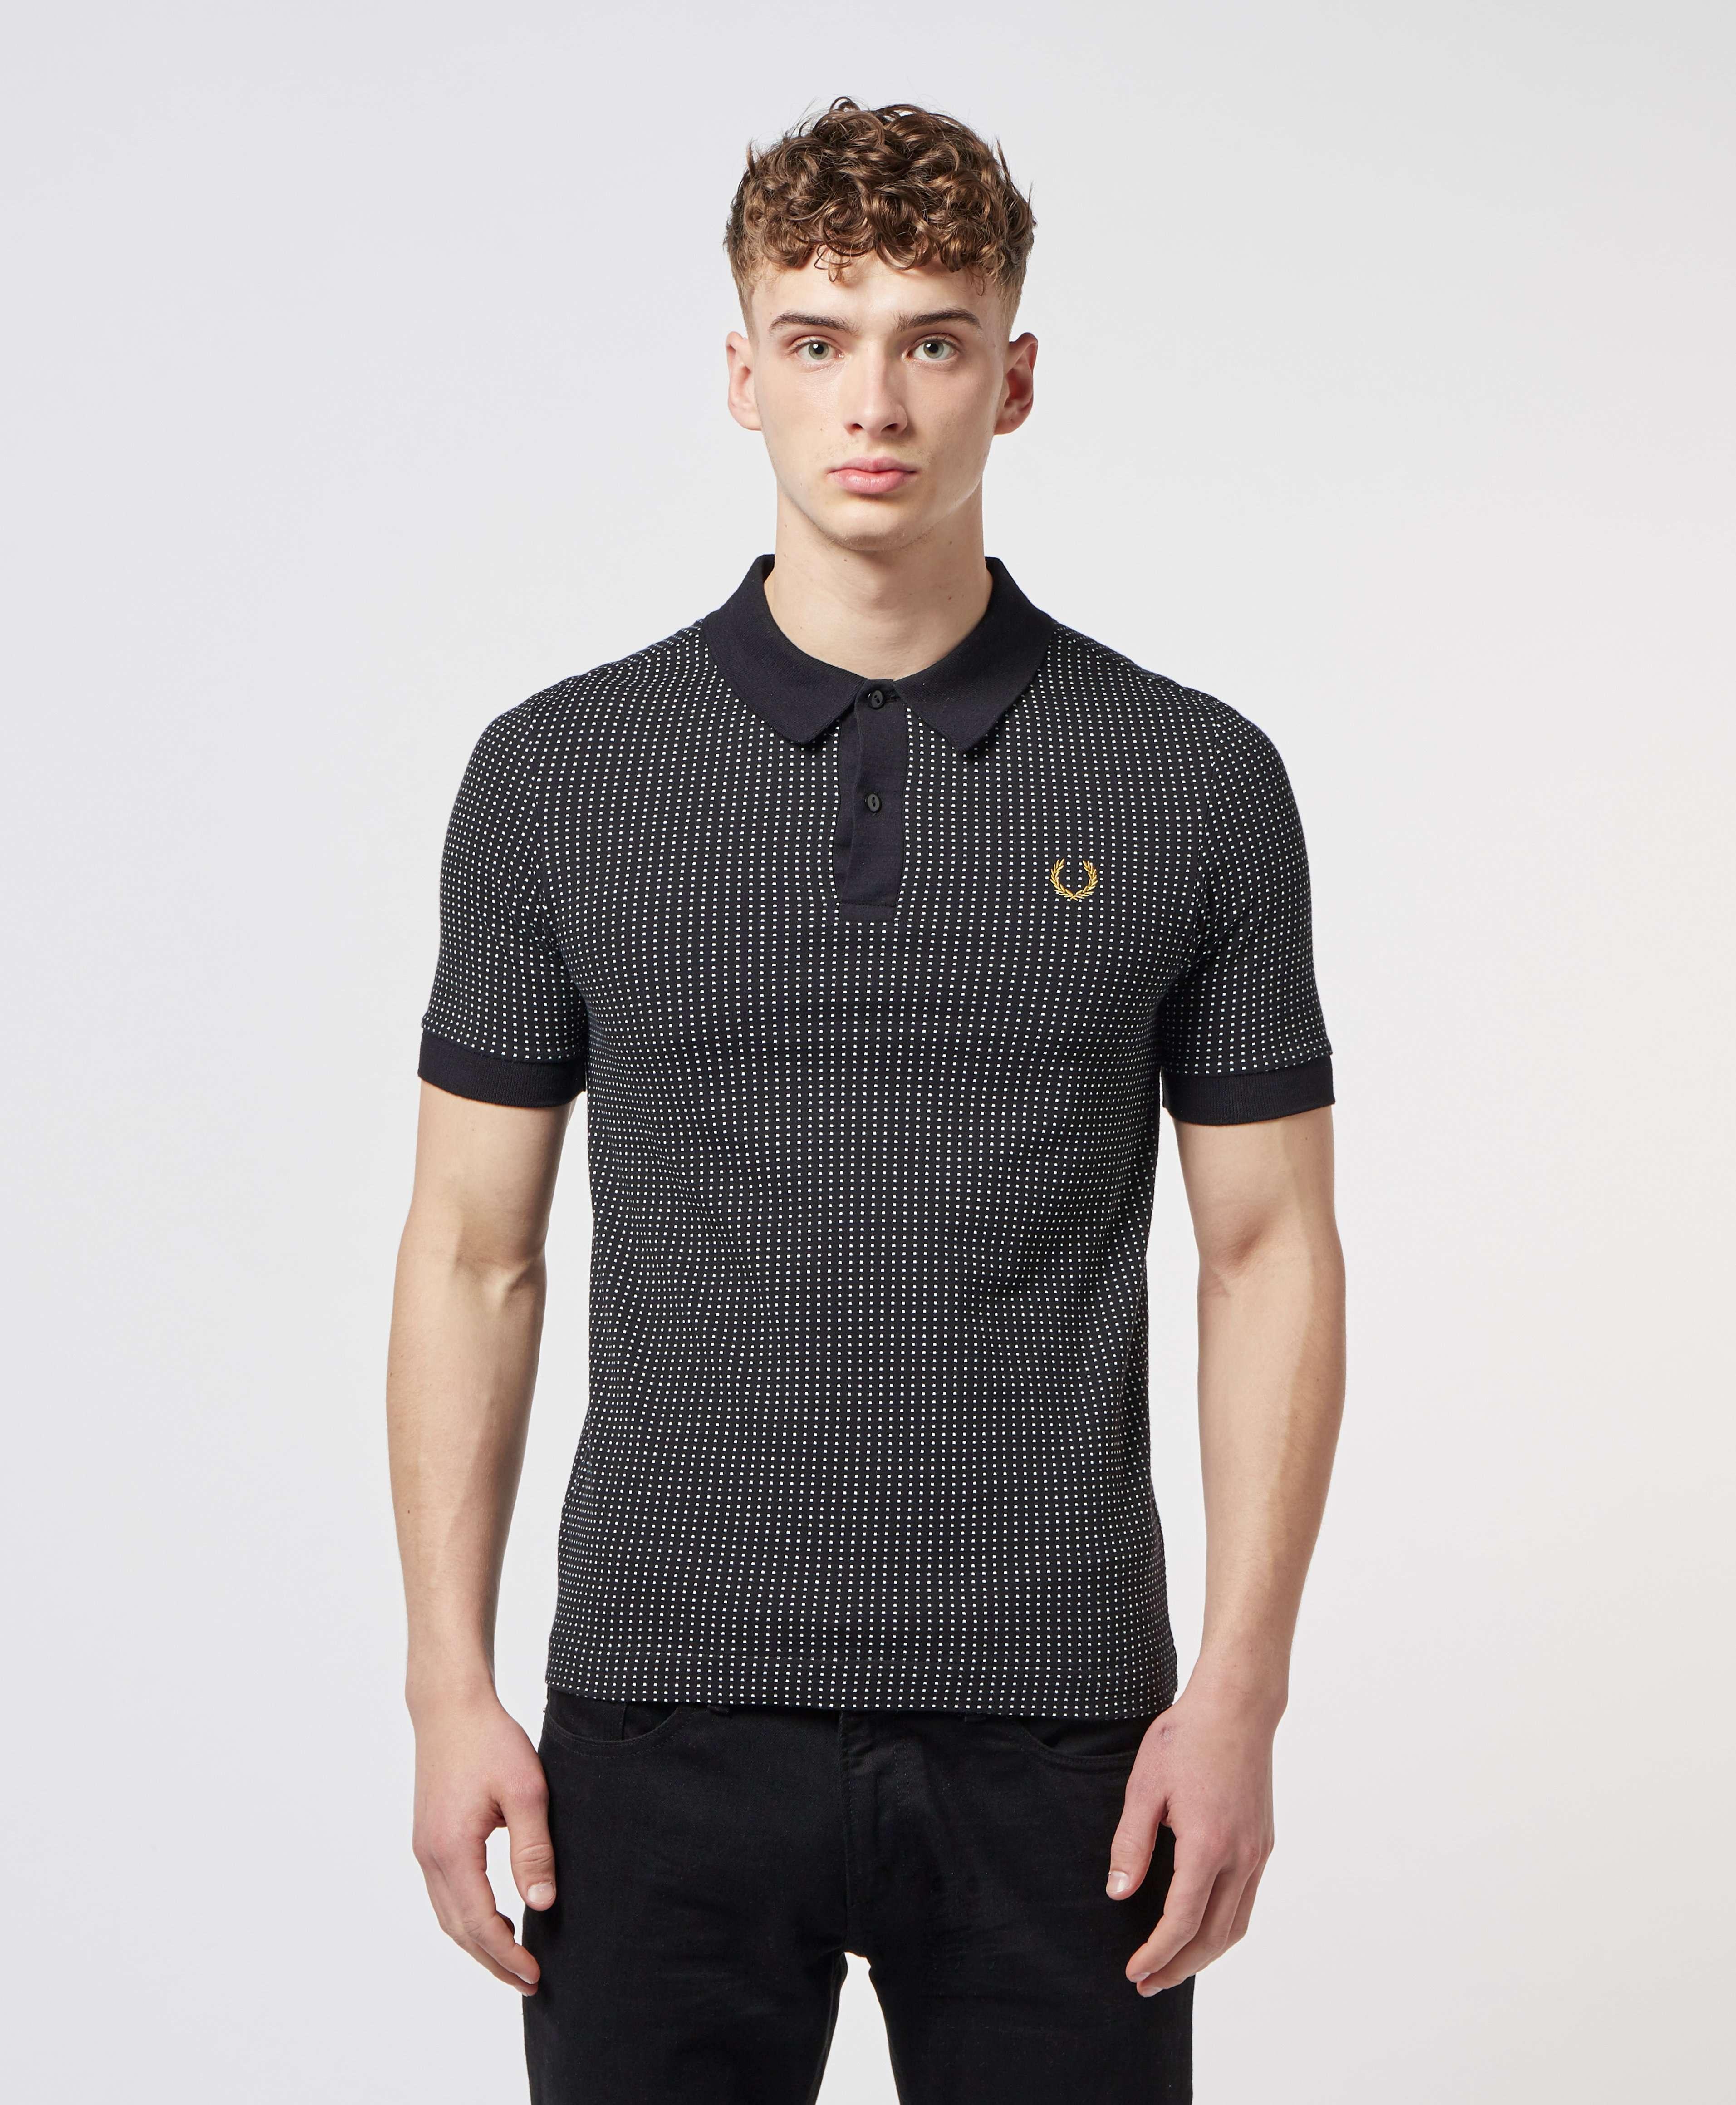 Fred Perry x Miles Kane Short Sleeve Jacquard Polo Shirt